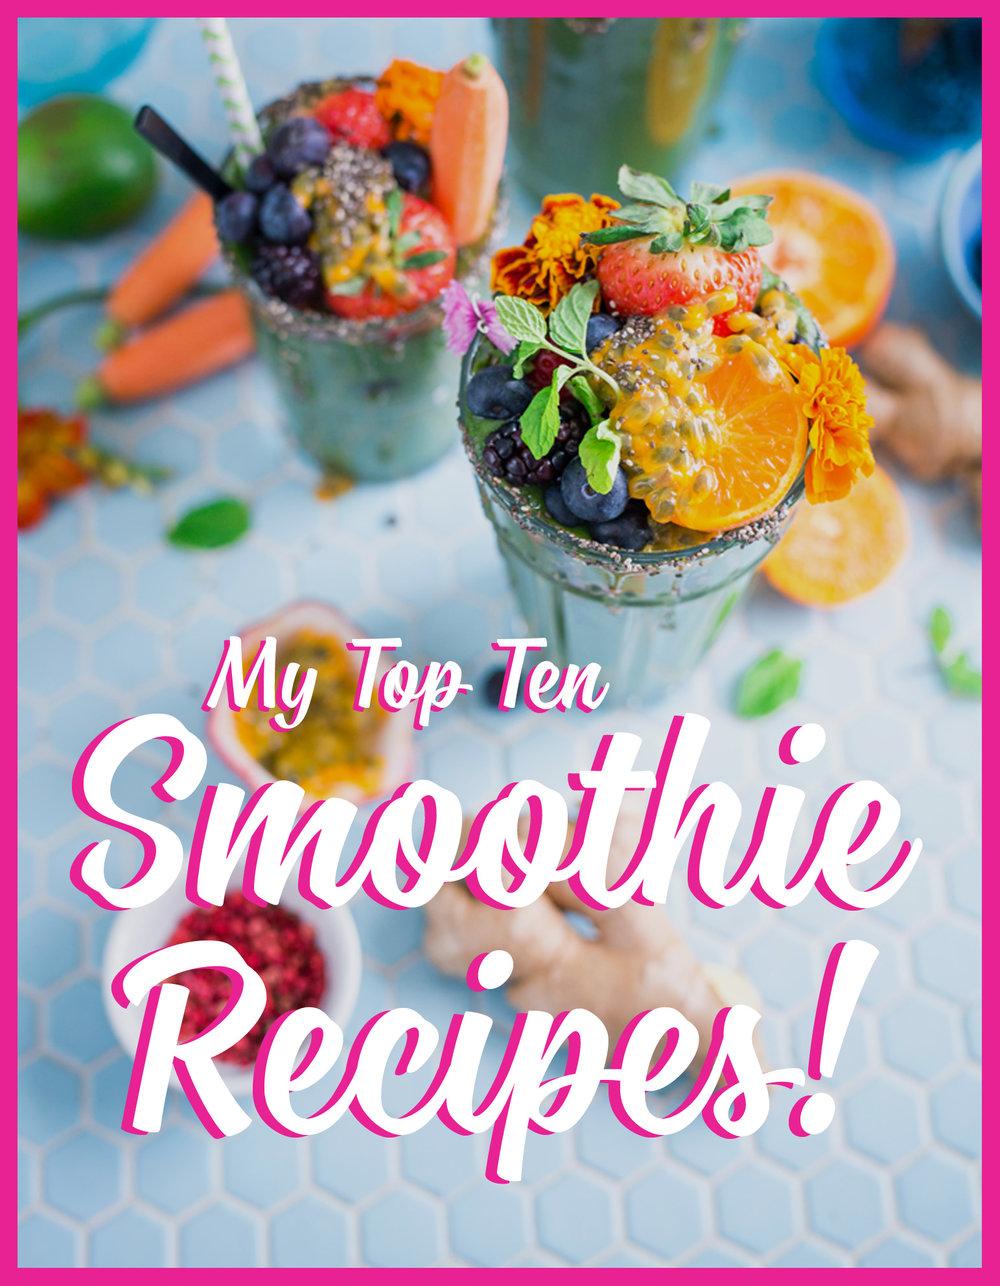 Julia Jackson - My Top 10 Smoothie Recipes